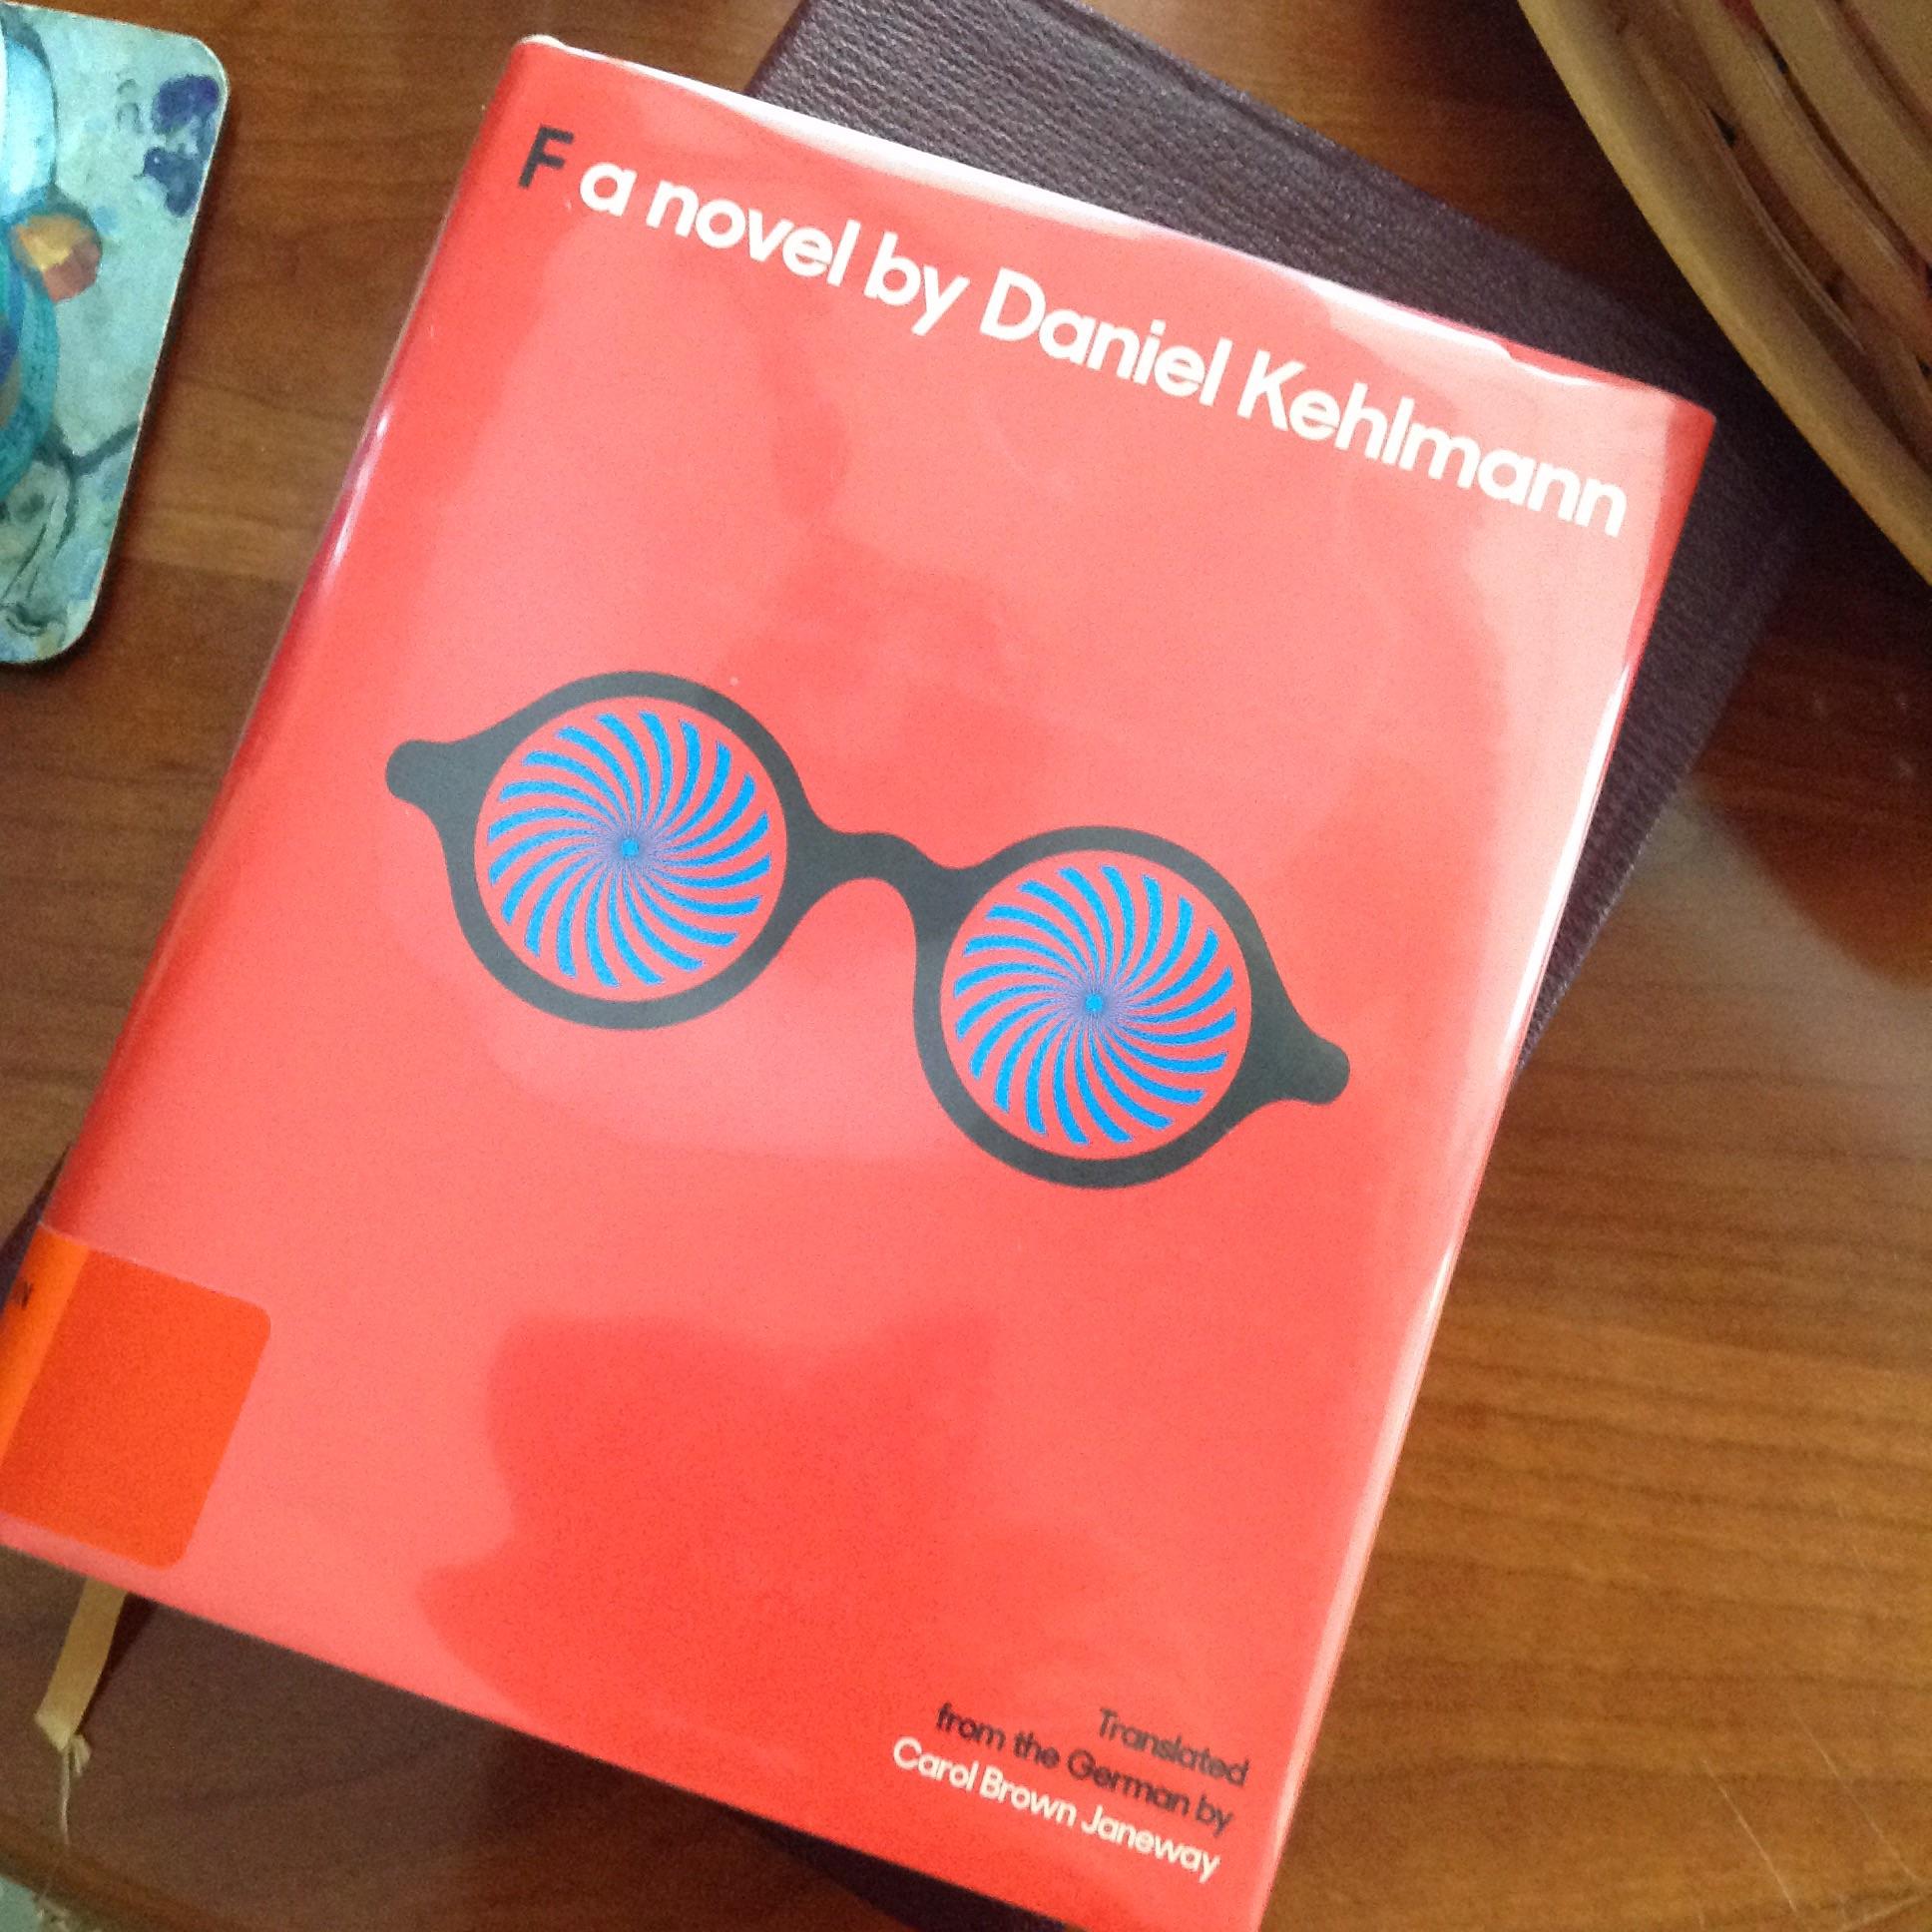 dissertation daniel kehlmann 2013